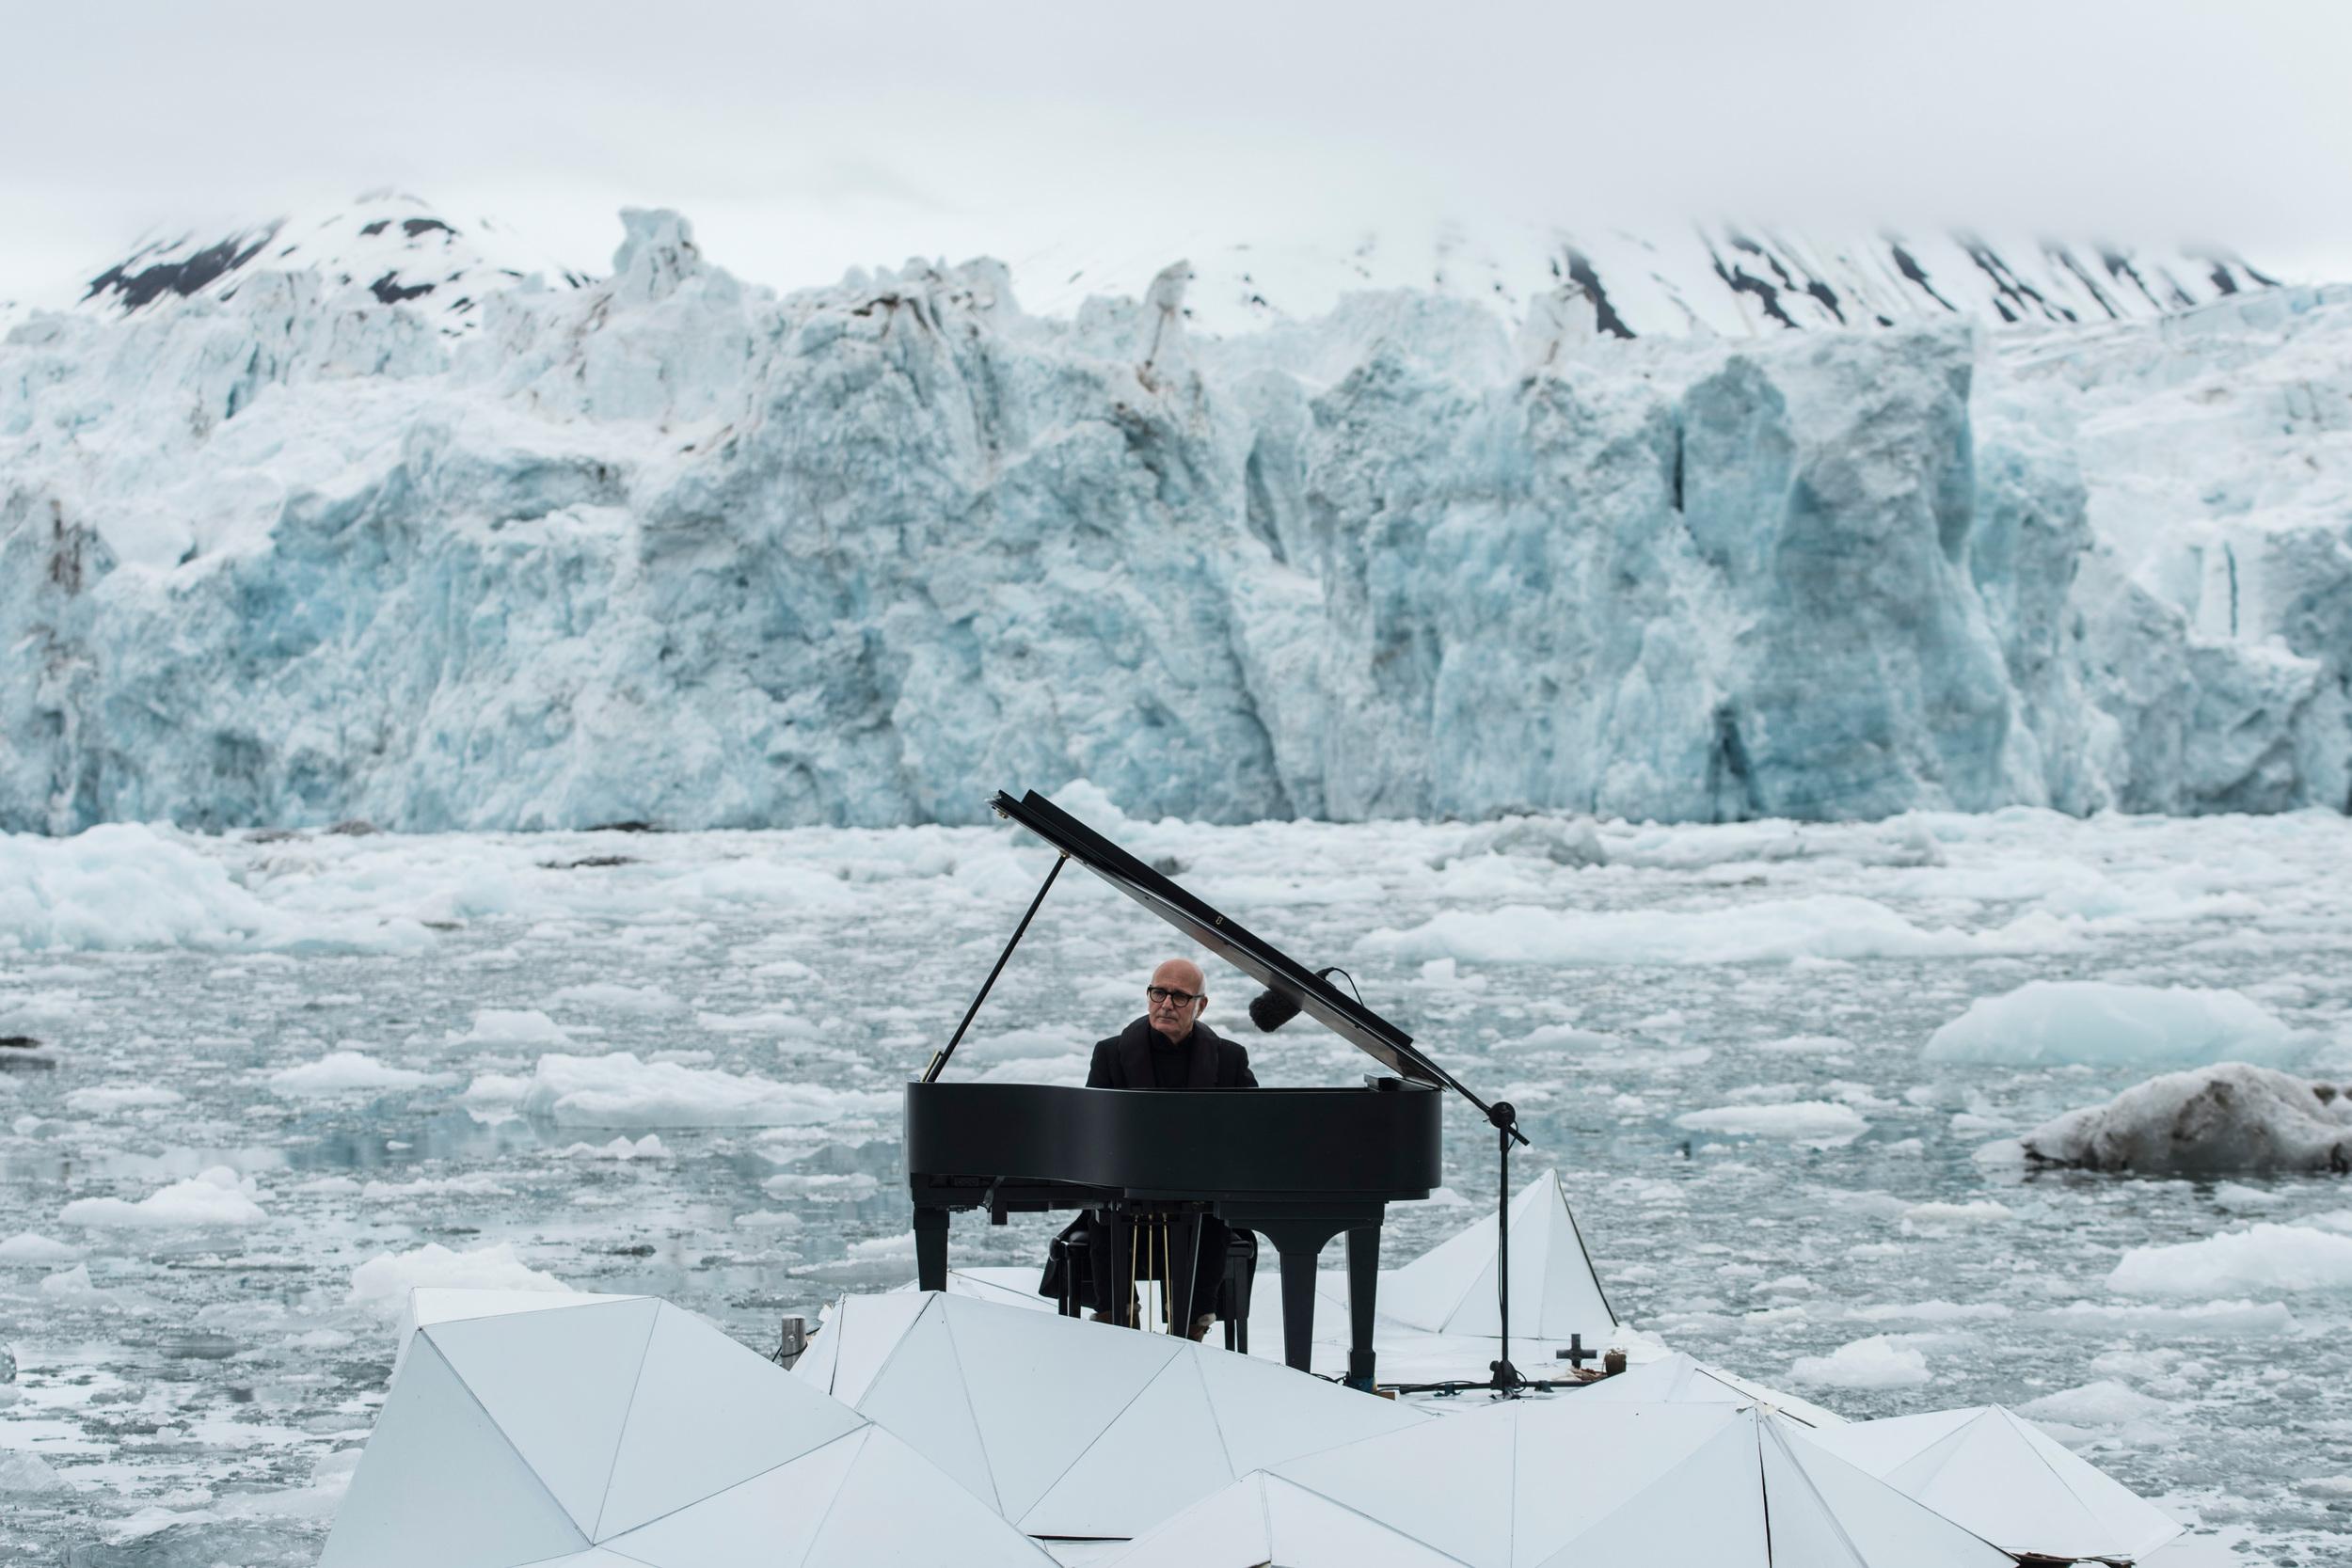 La musica di Einaudi a difesa dellu2019Artico